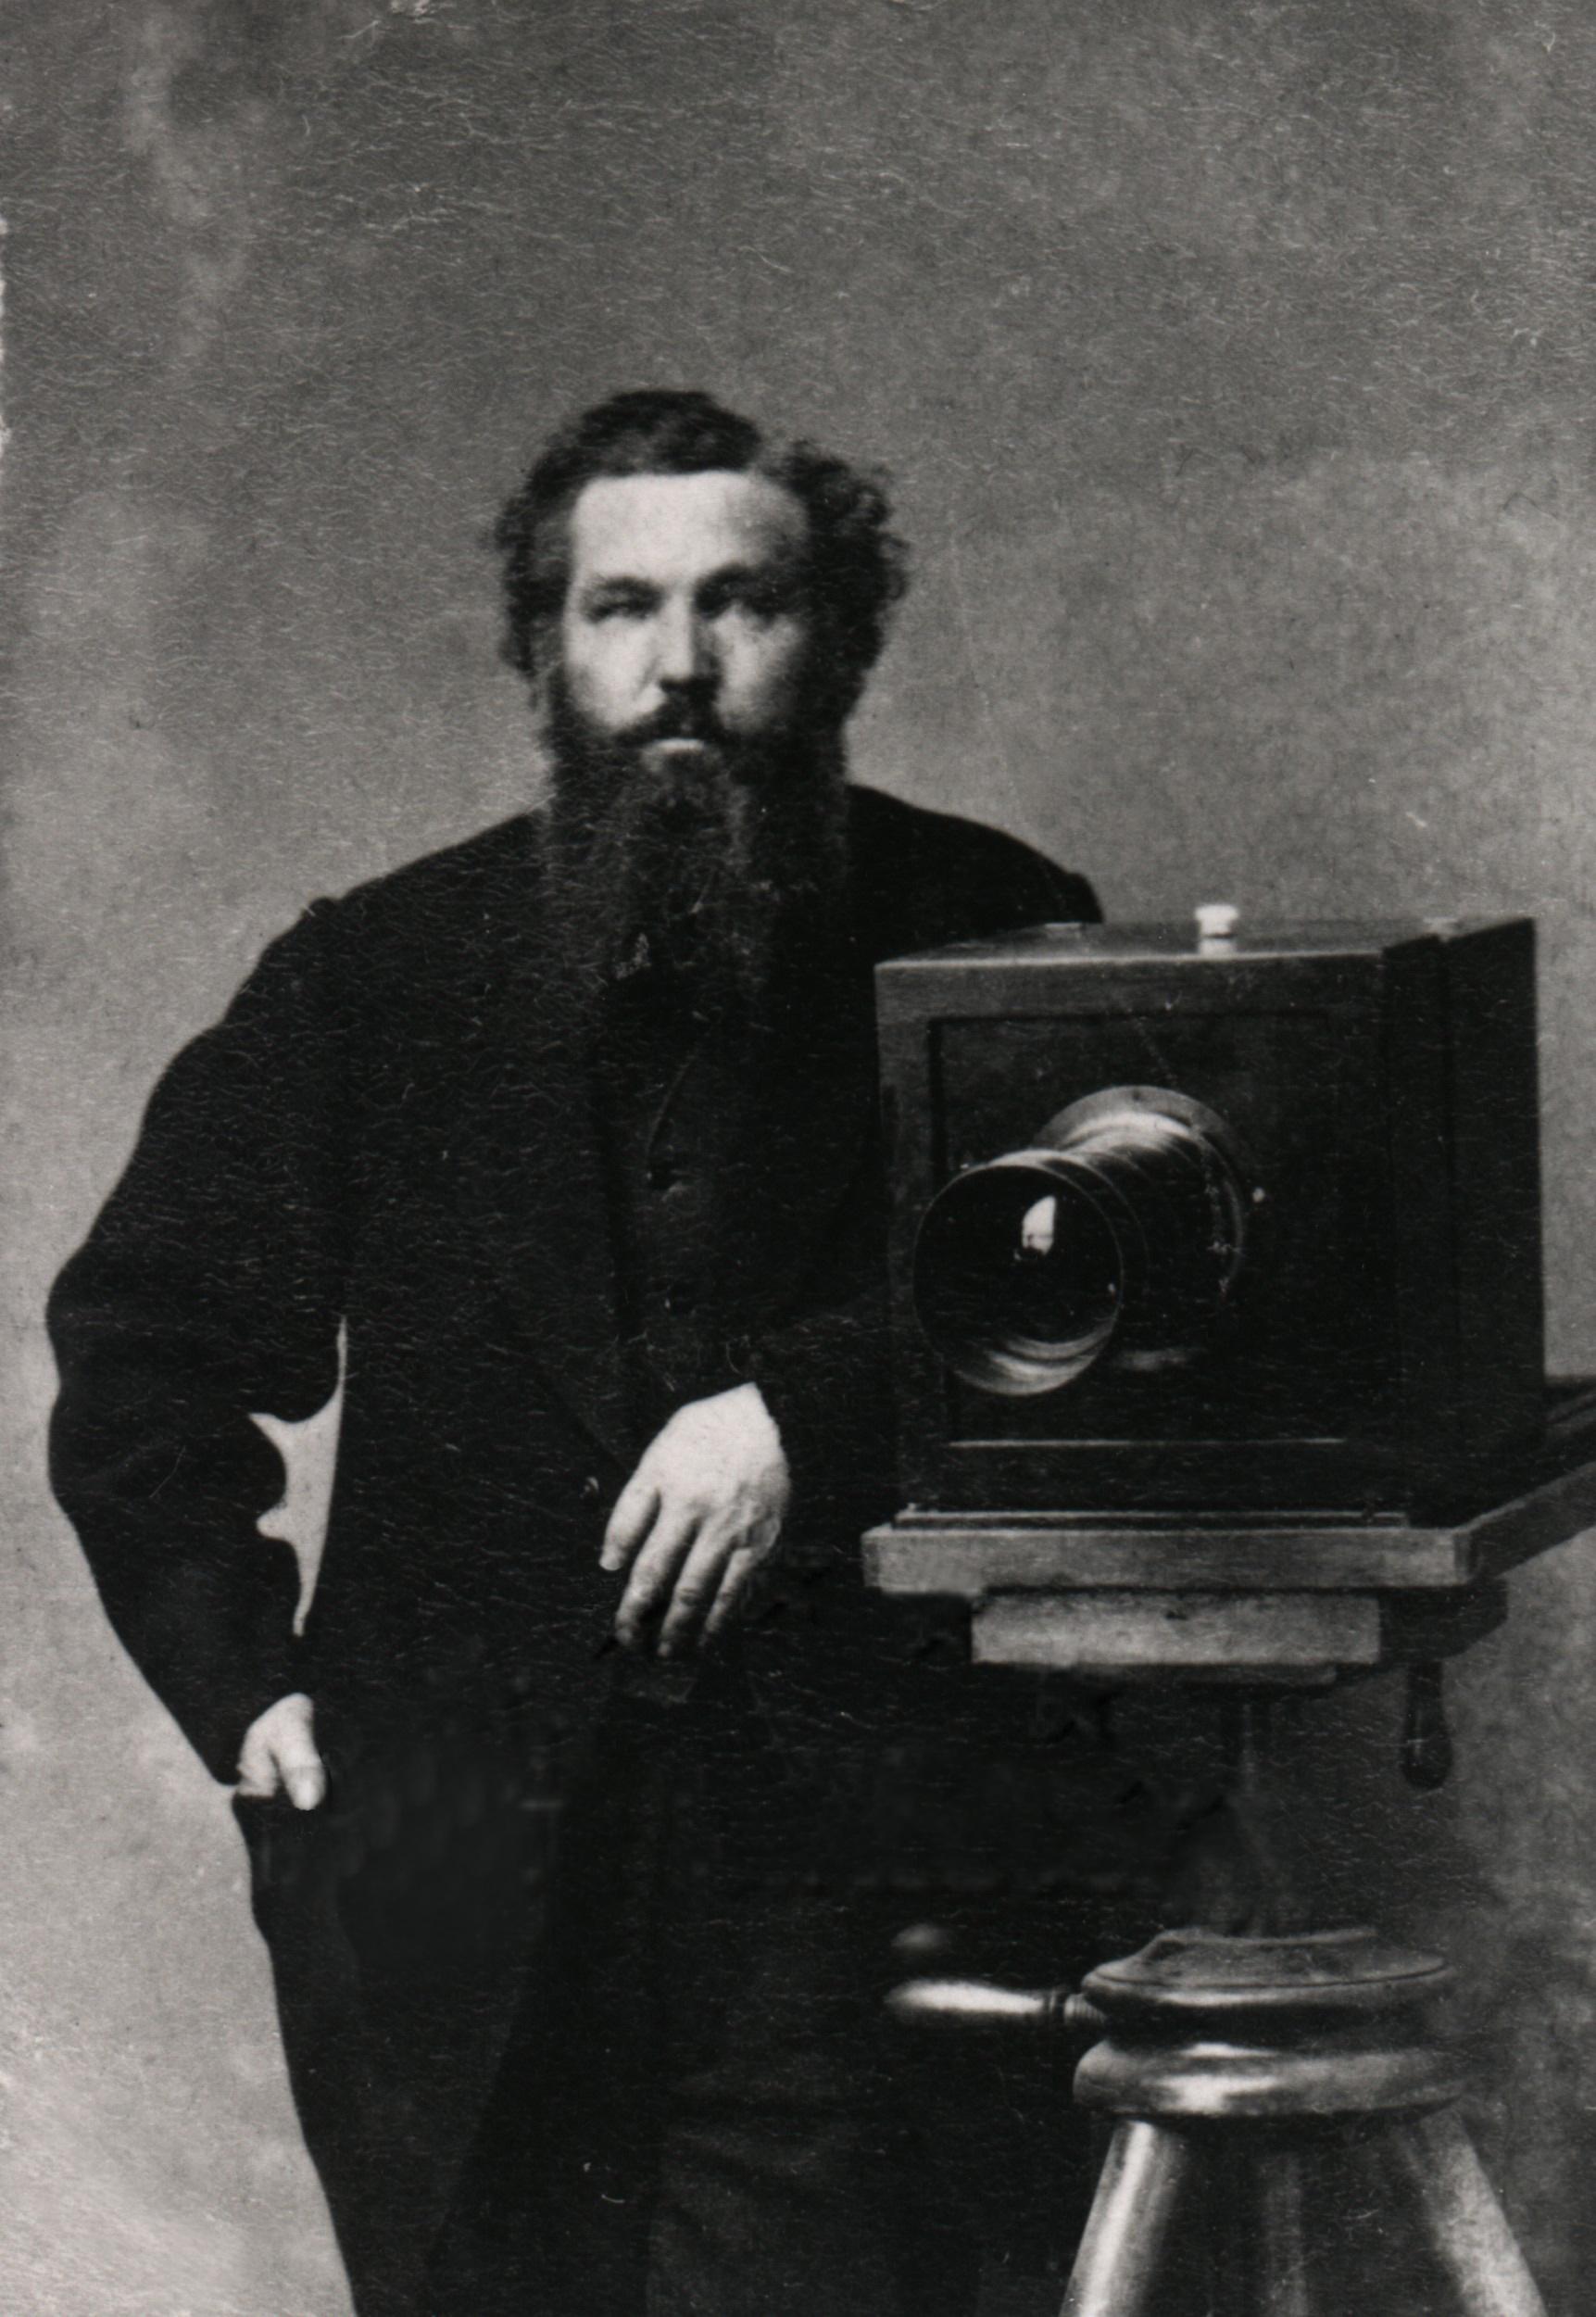 Alexander Gardner Photographer Wikipedia